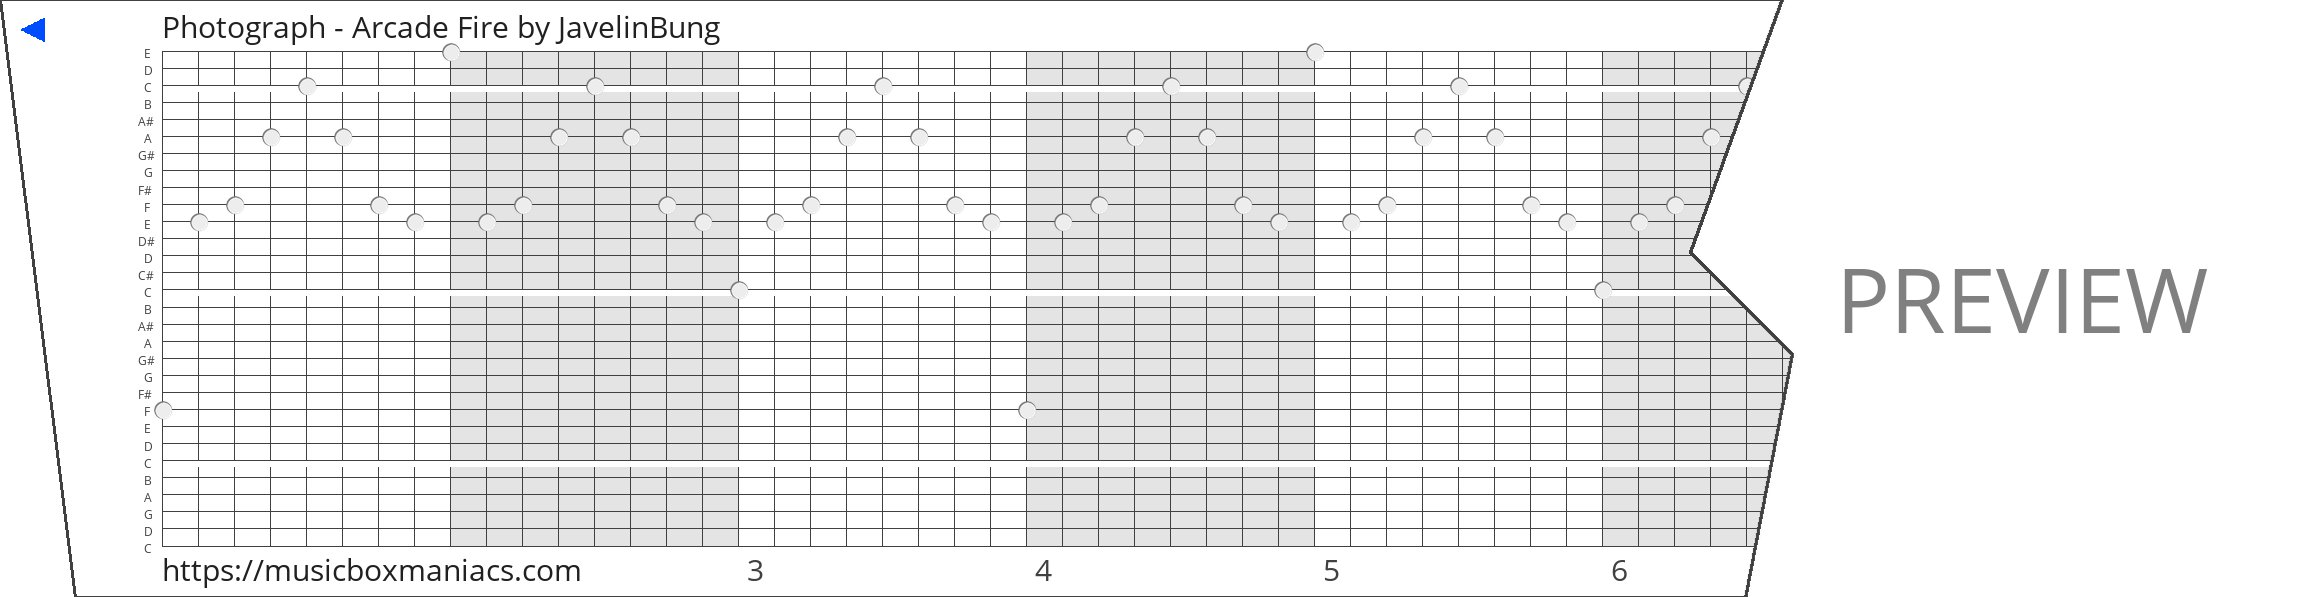 Photograph - Arcade Fire 30 note music box paper strip